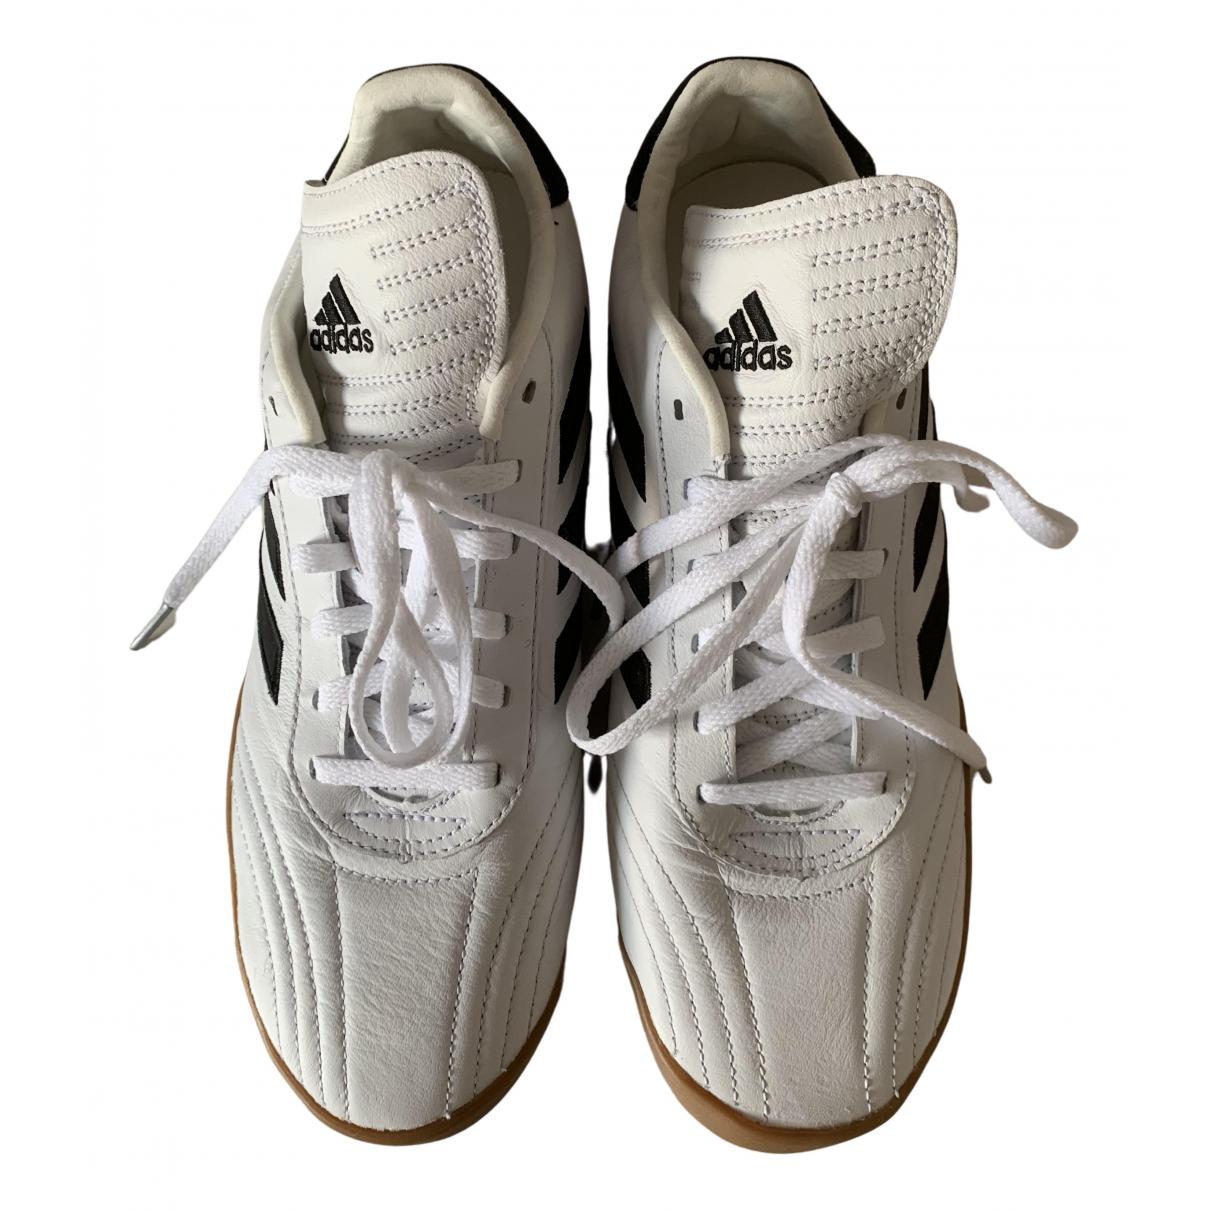 Adidas X Gosha Rubchinskiy \N White Leather Trainers for Men 40.5 EU